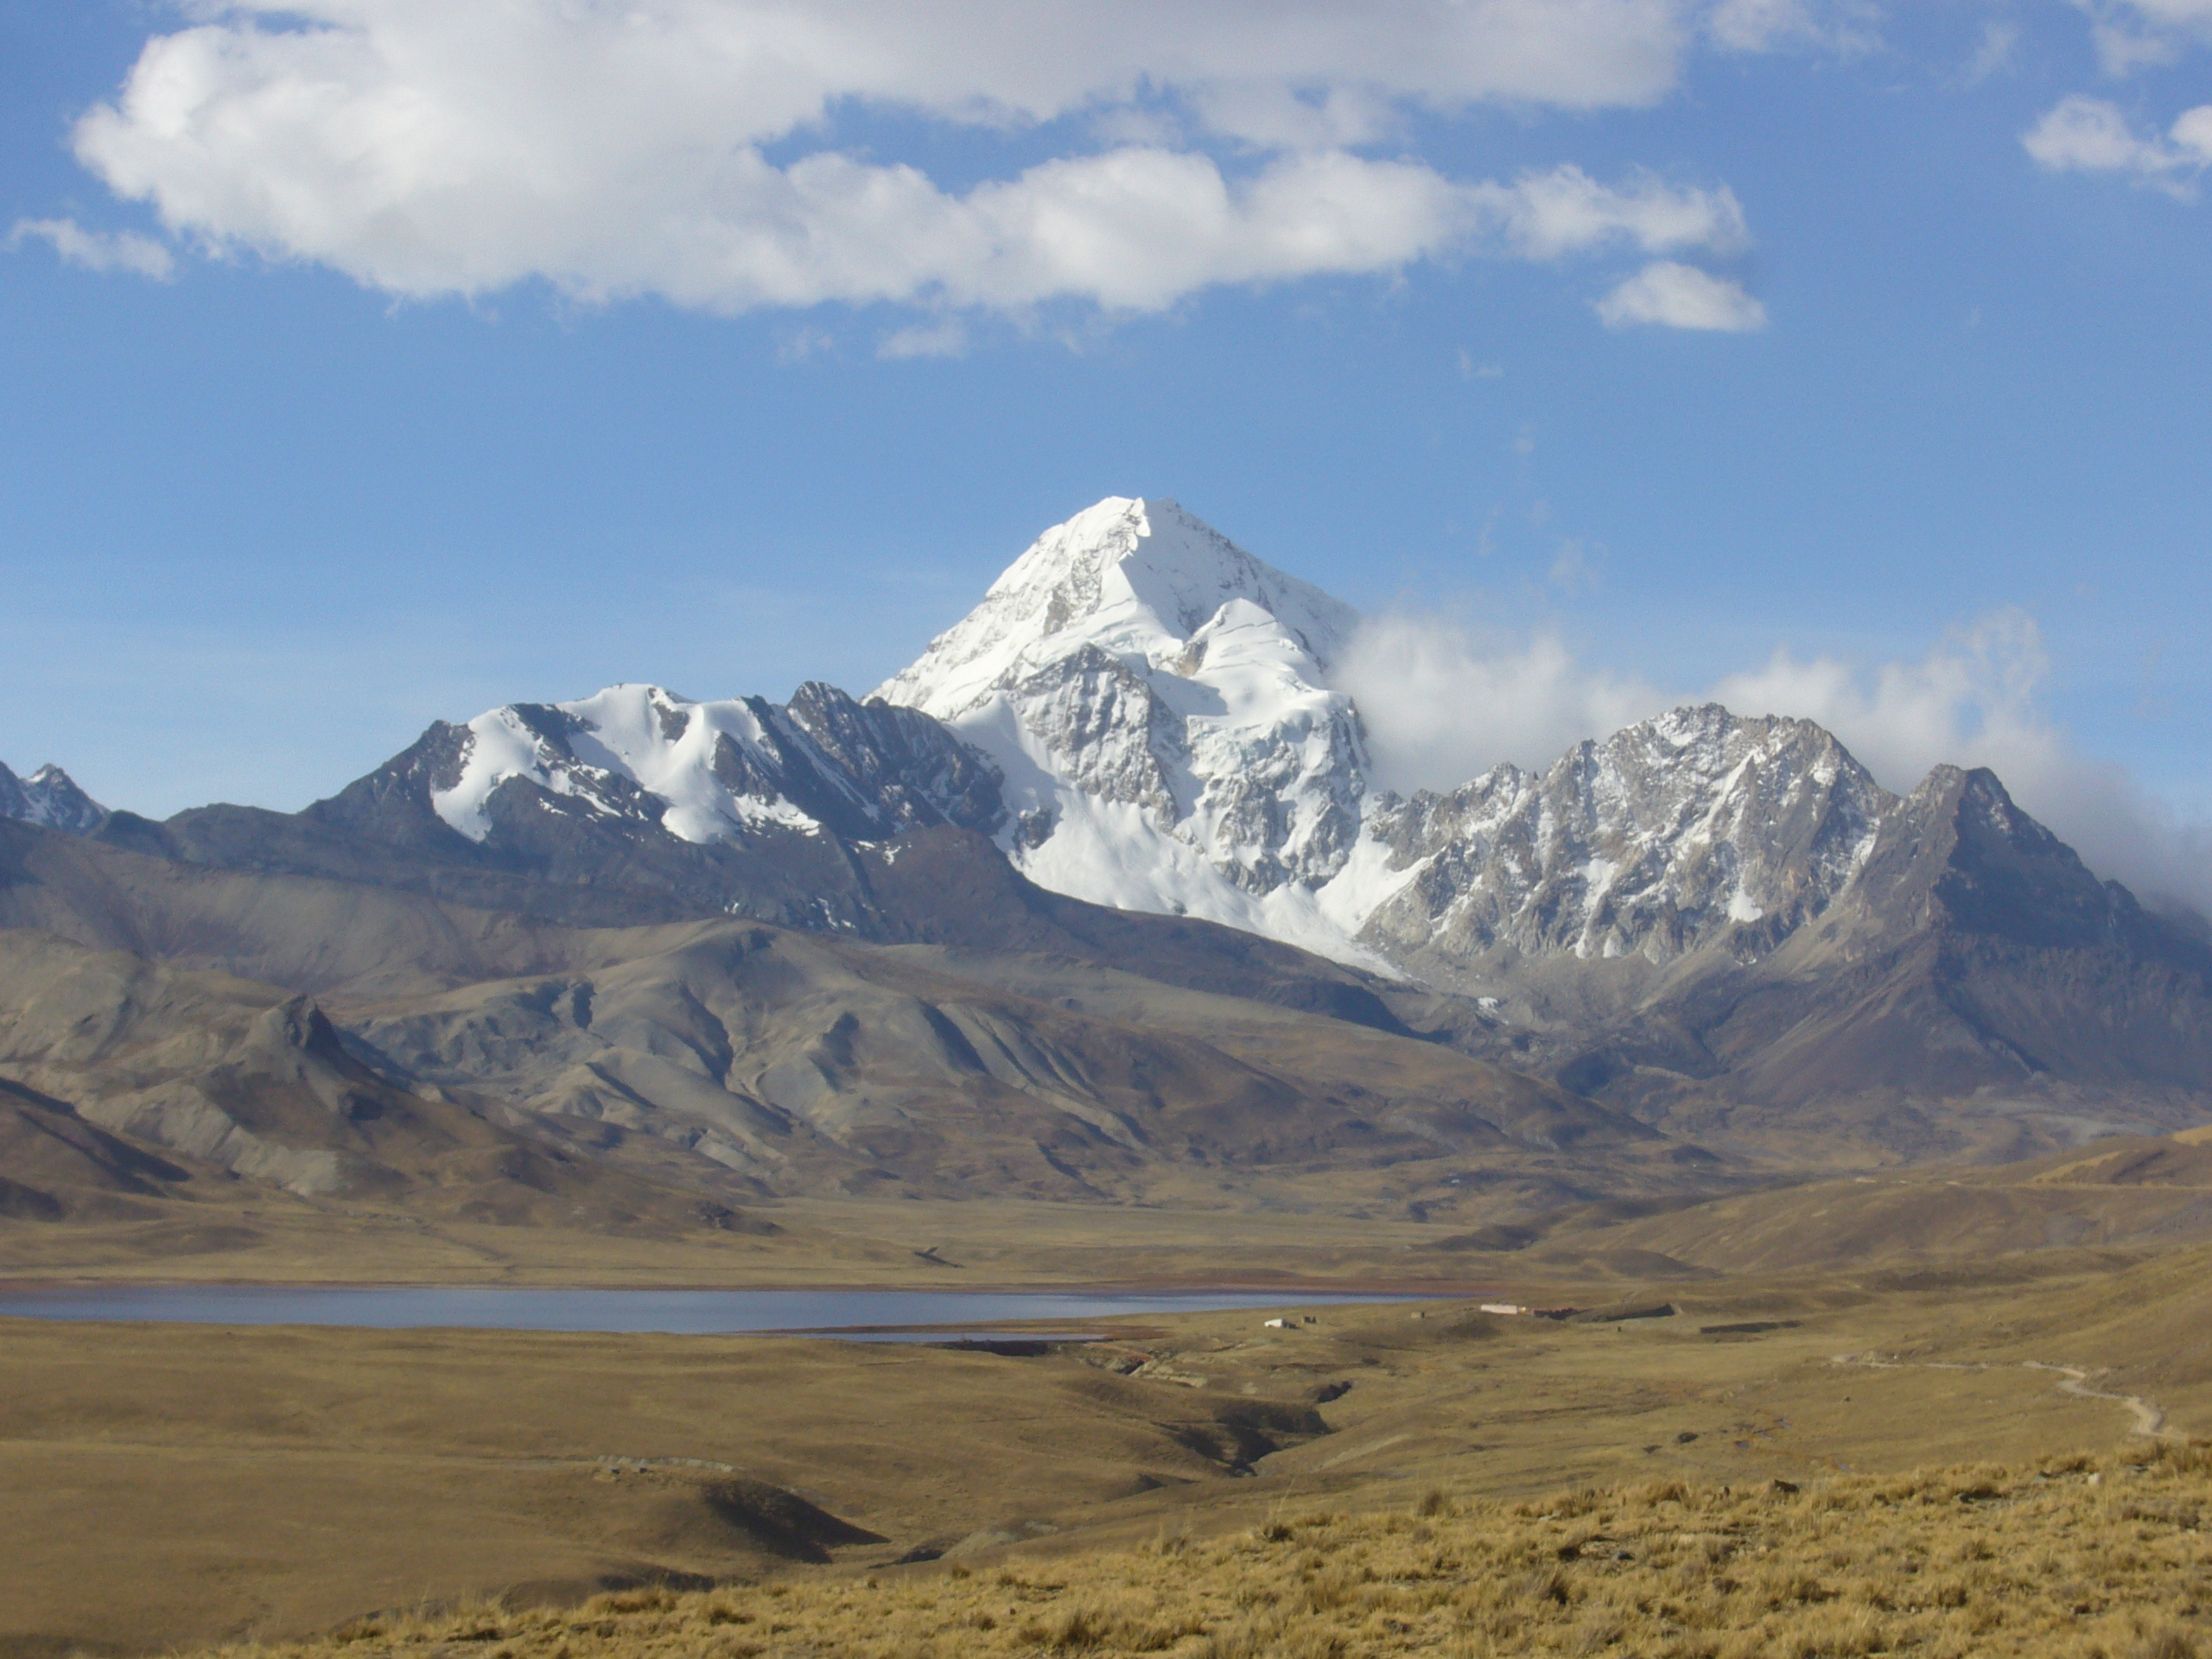 Radreise Peru 2008 - Huayna Potosi mit Laguna Jankno Kkoto